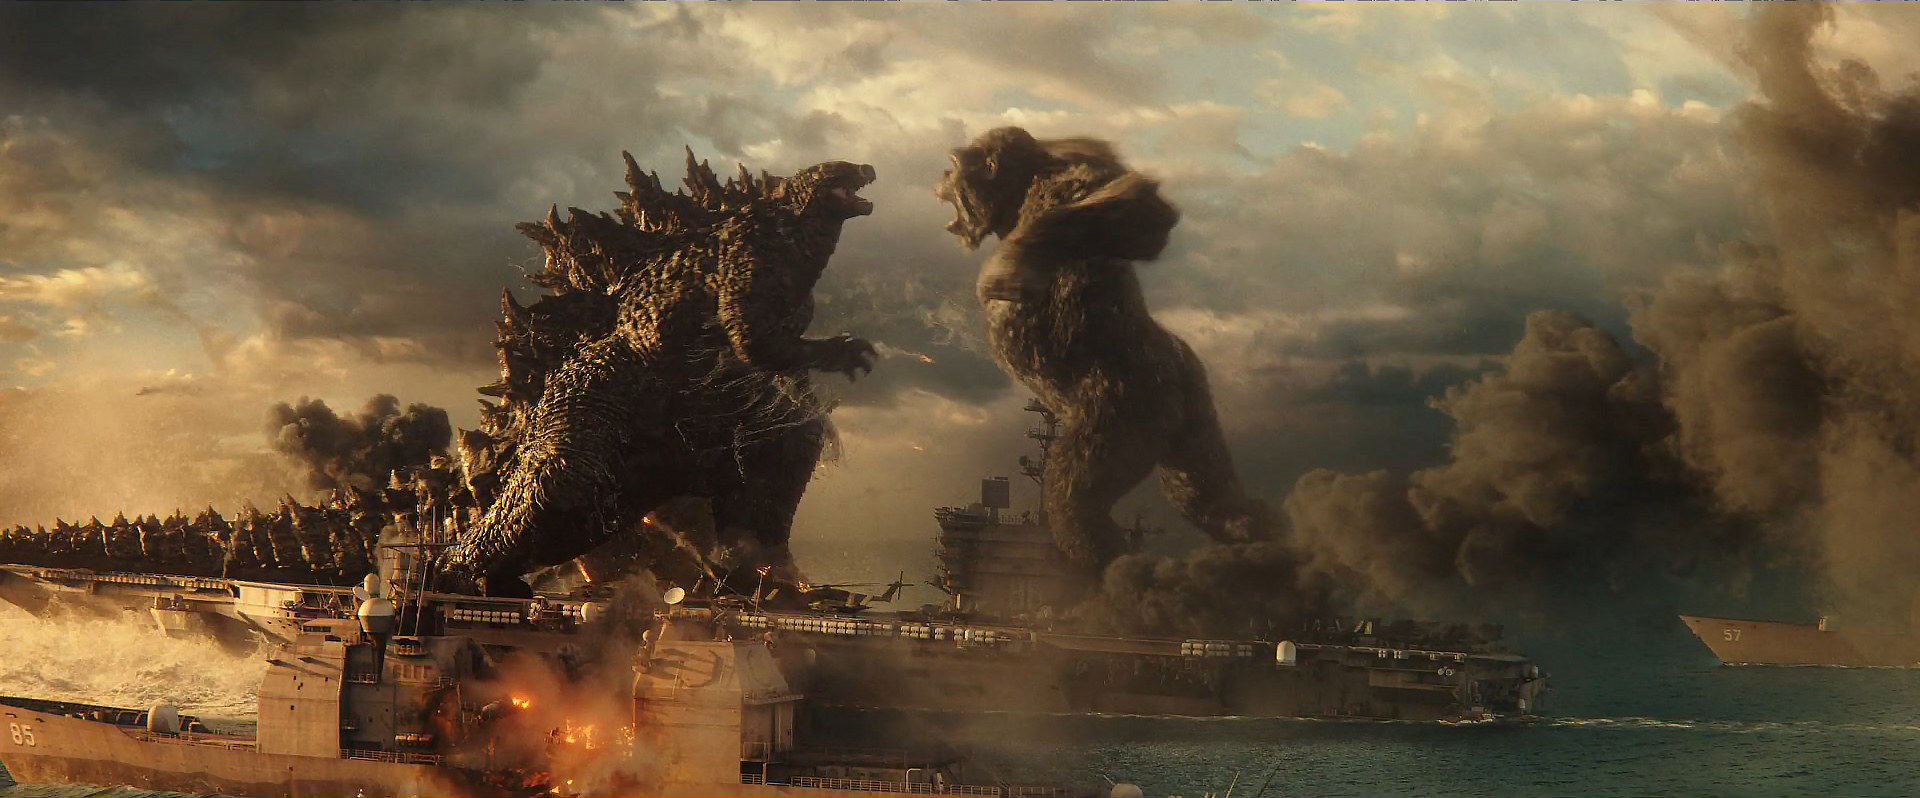 Godzilla and King Kong prepare to clash above a smoking battle ship